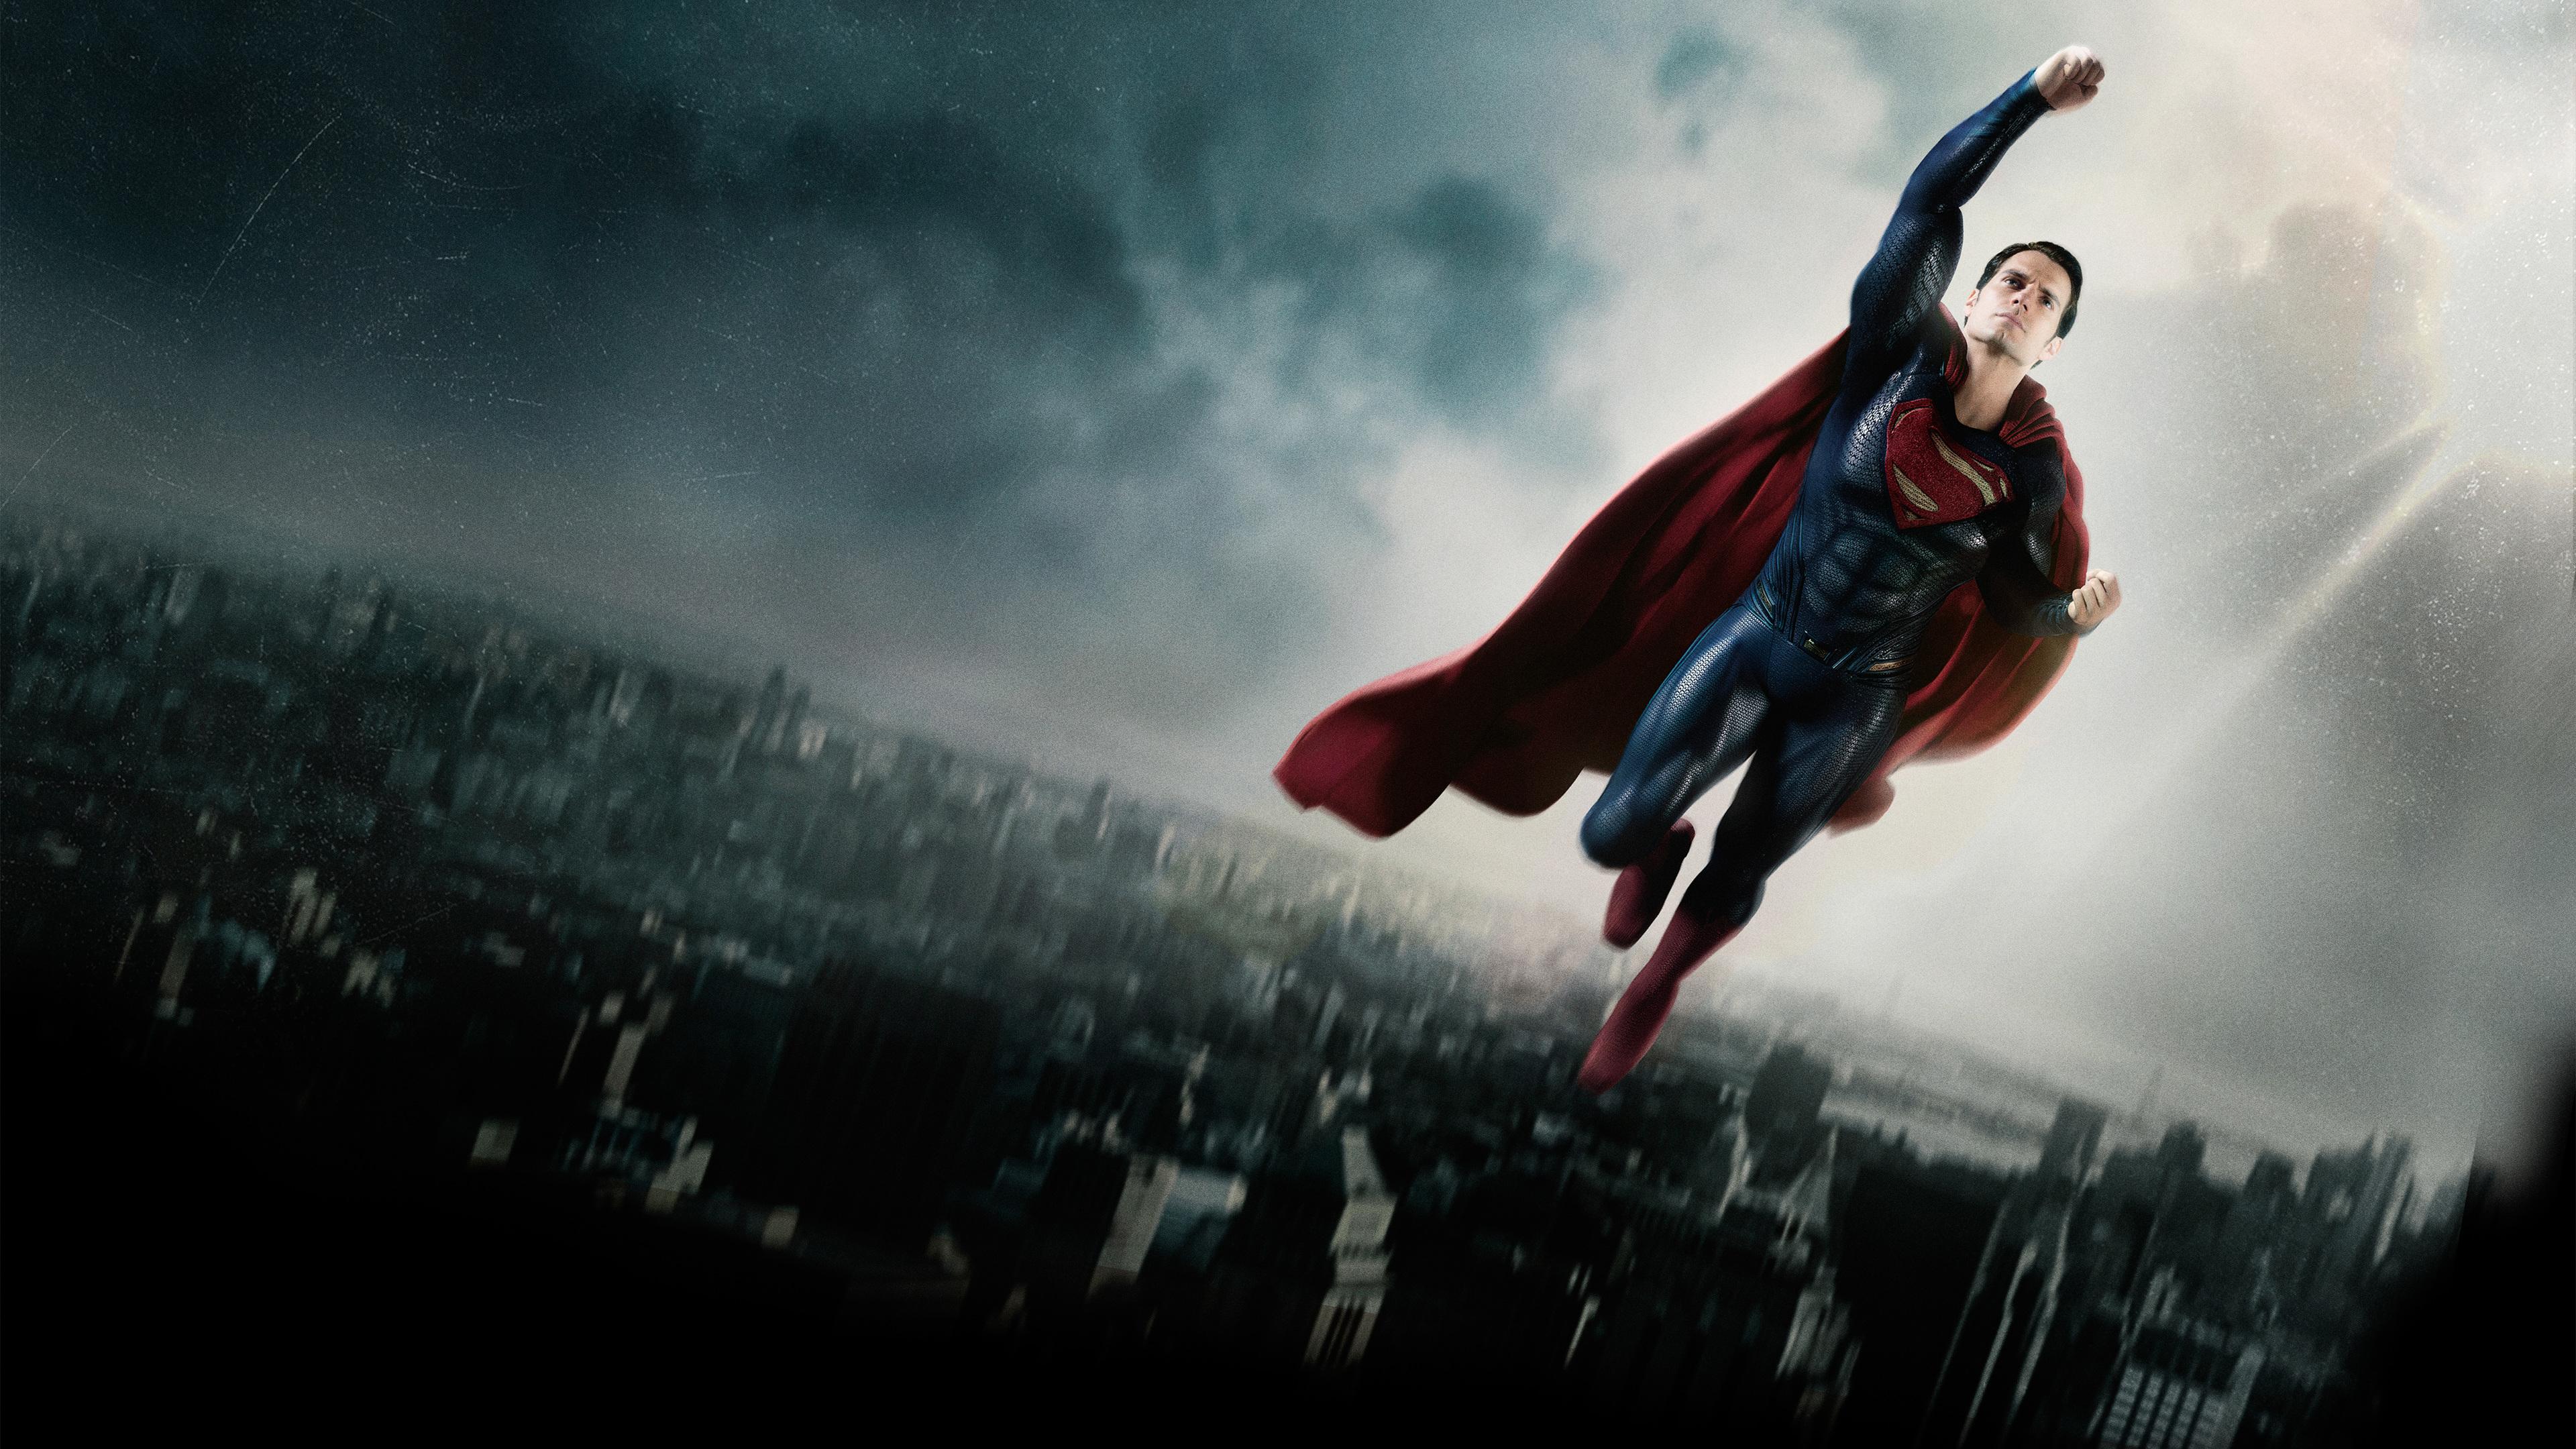 superman 4k 1553069885 - Superman 4k - superman wallpapers, superheroes wallpapers, hd-wallpapers, 8k wallpapers, 5k wallpapers, 4k-wallpapers, 10k wallpapers